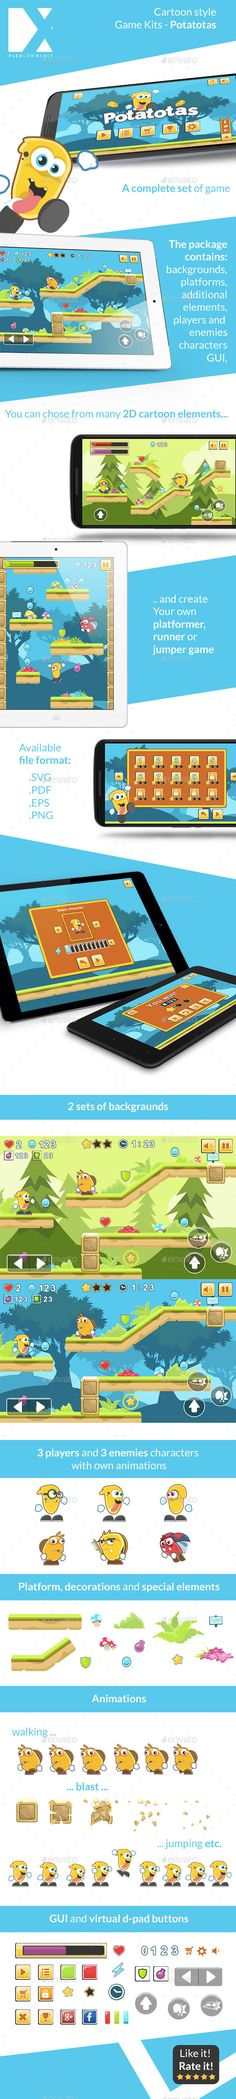 Potatotas - Game Asset Download here: https://graphicriver.net/item/potatotas-game-asset/10128119?ref=KlitVogli